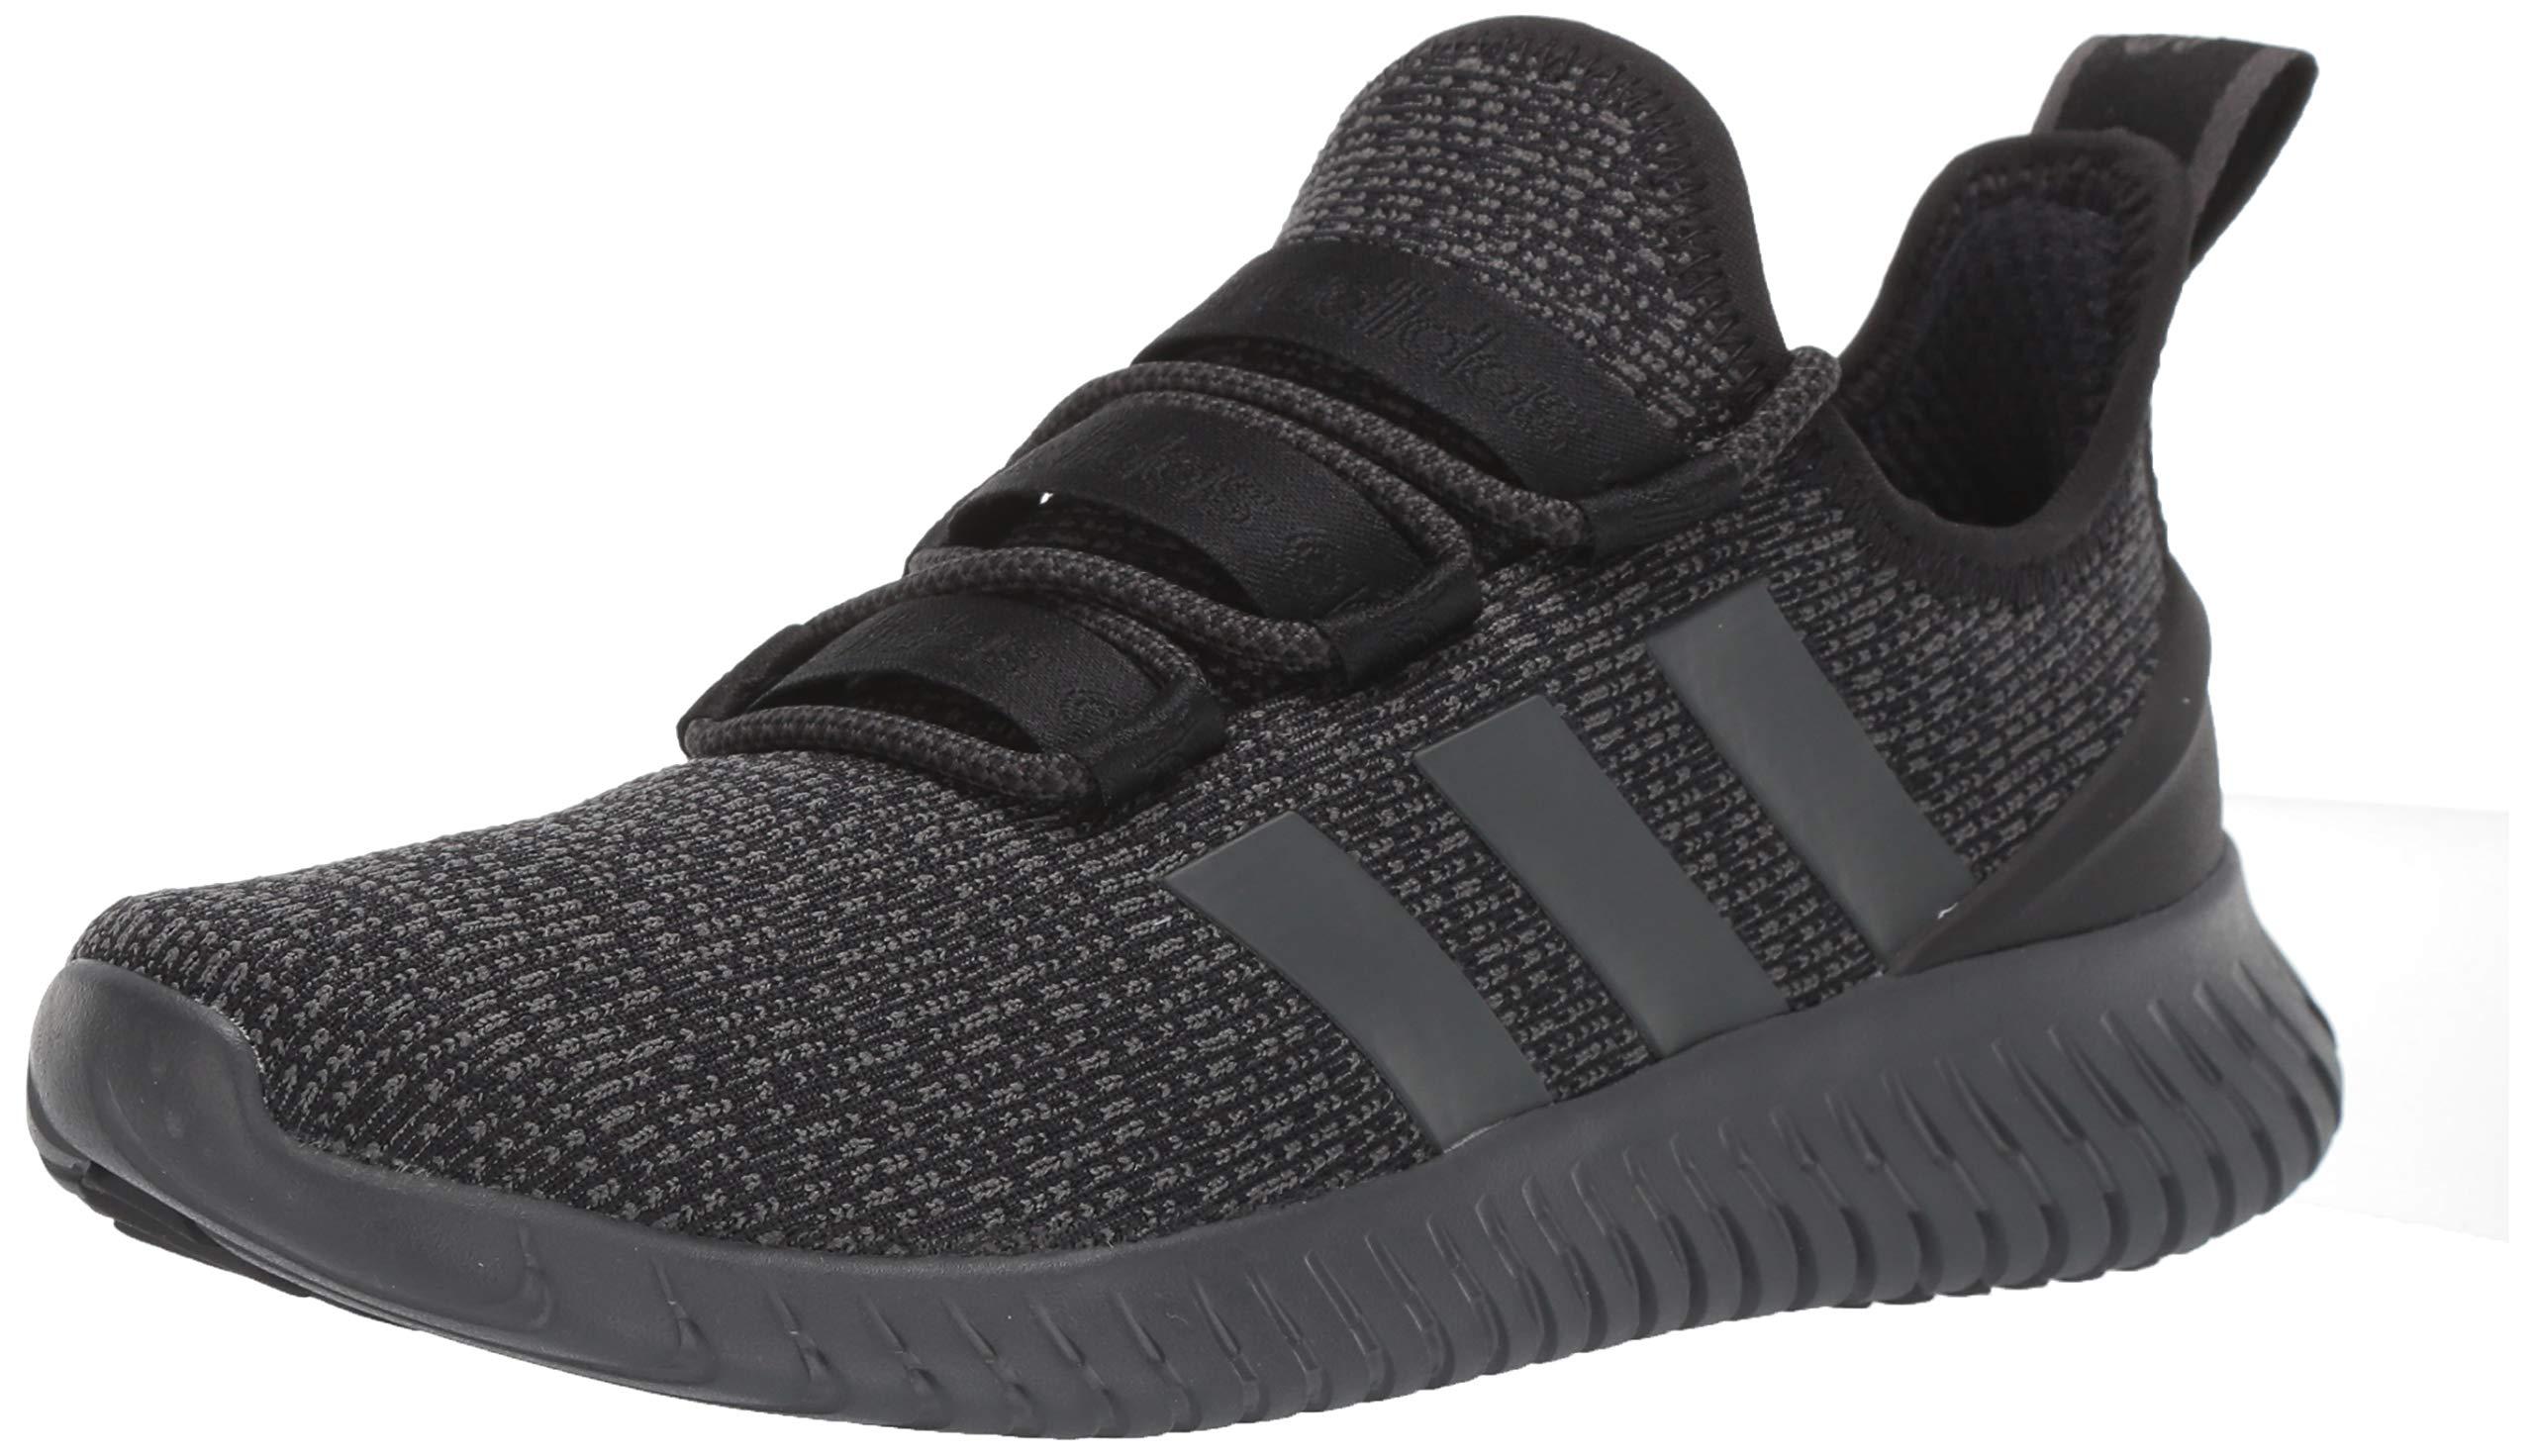 Details about adidas Mens Kaptir Running Shoes - Black Grey - 11